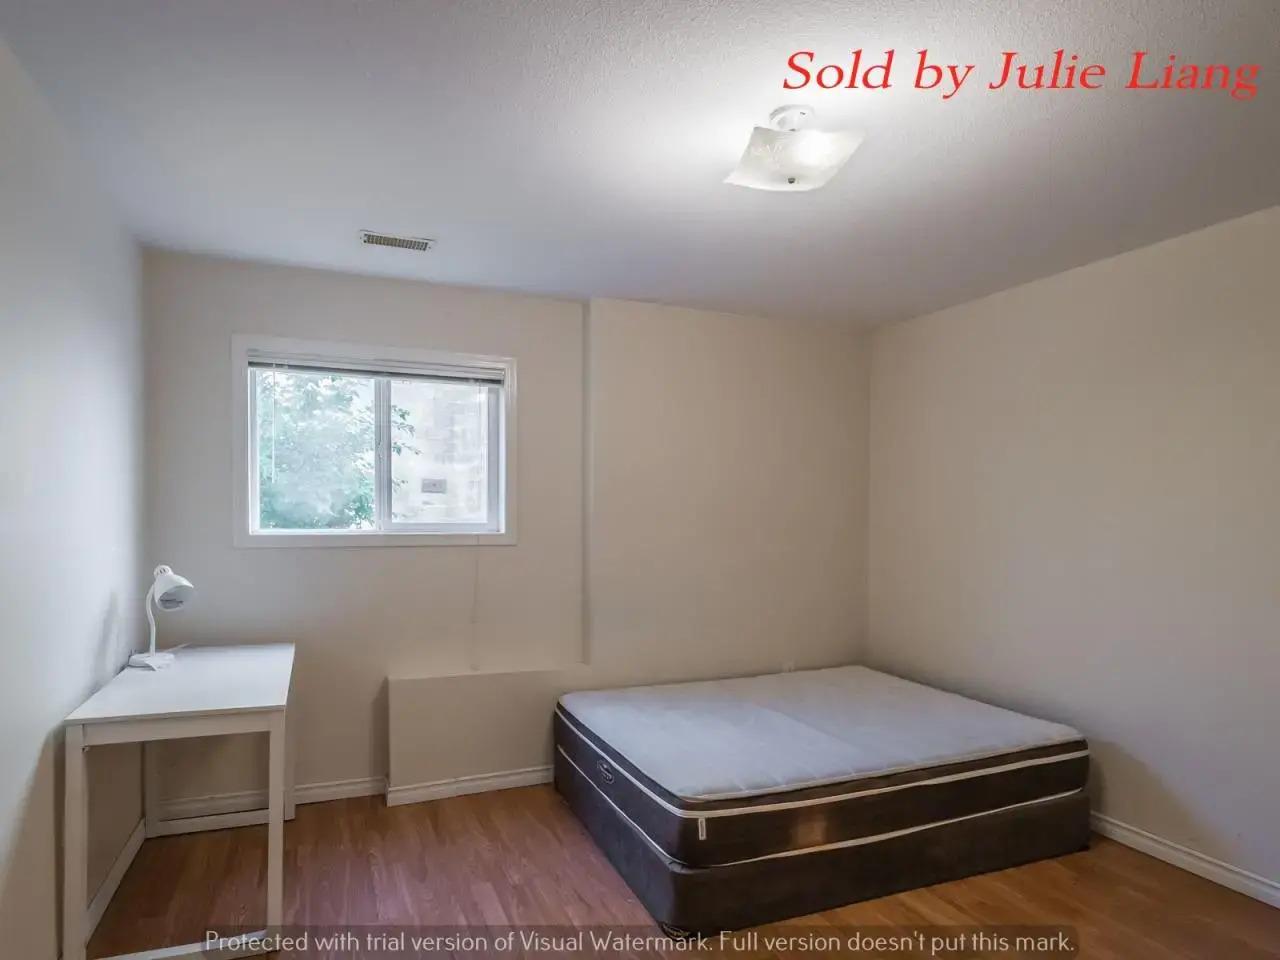 - Just Sold ! 纳奈莫房产最新售出大学附近七室五卫海景别墅